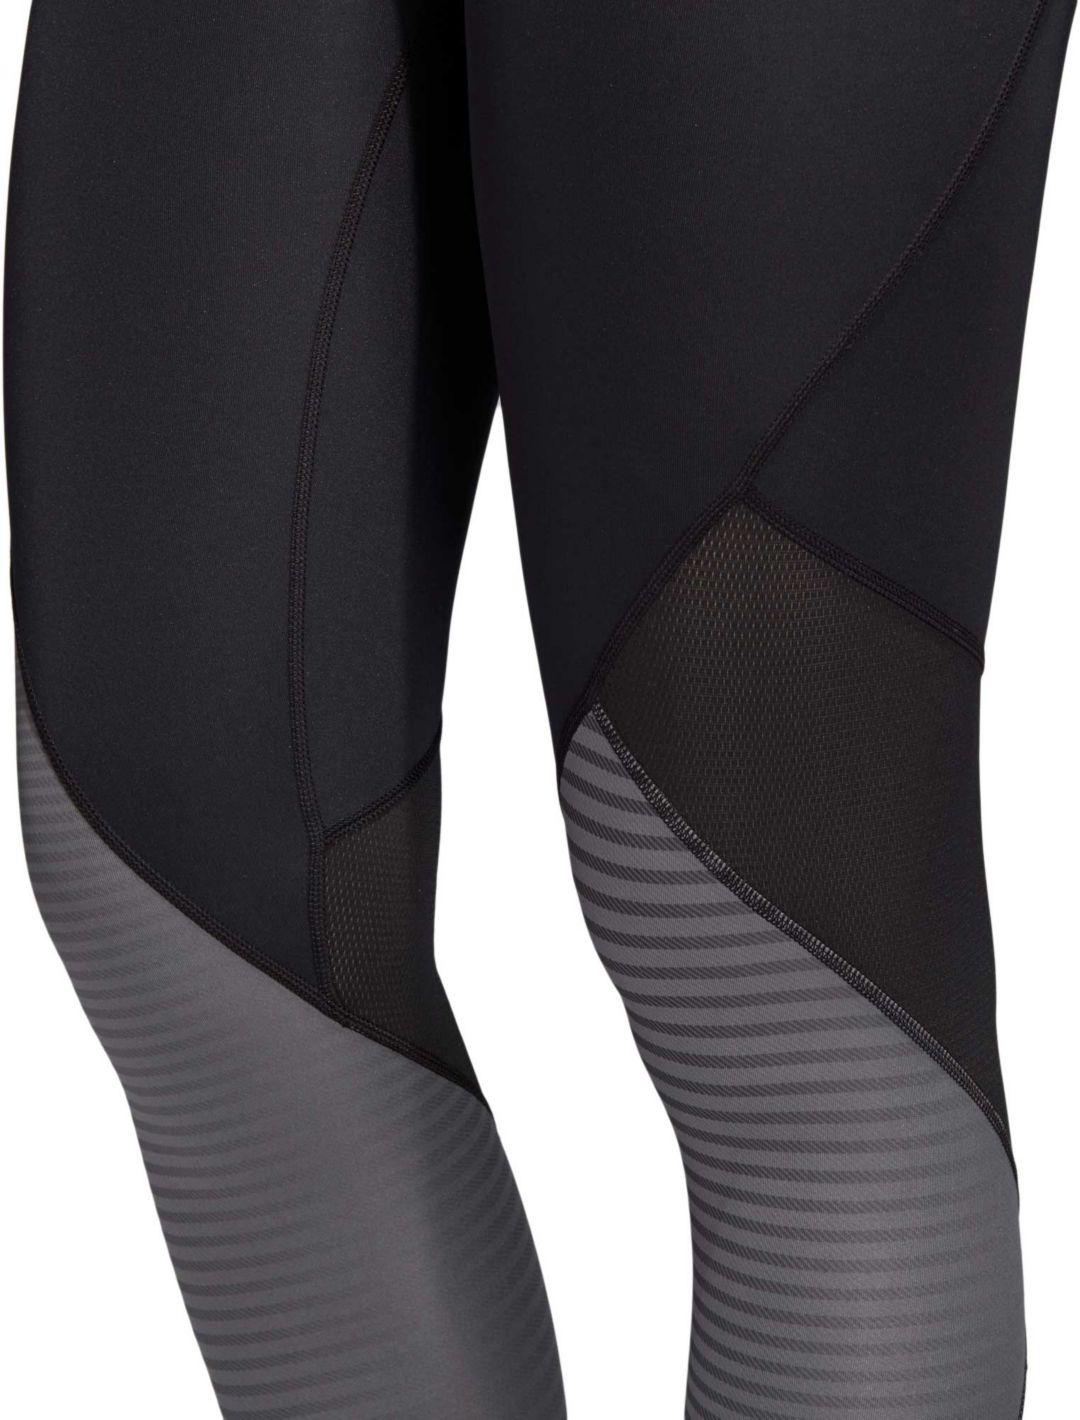 e94c5fa7aba adidas Women s Alphaskin Sport Long Printed Tights 2